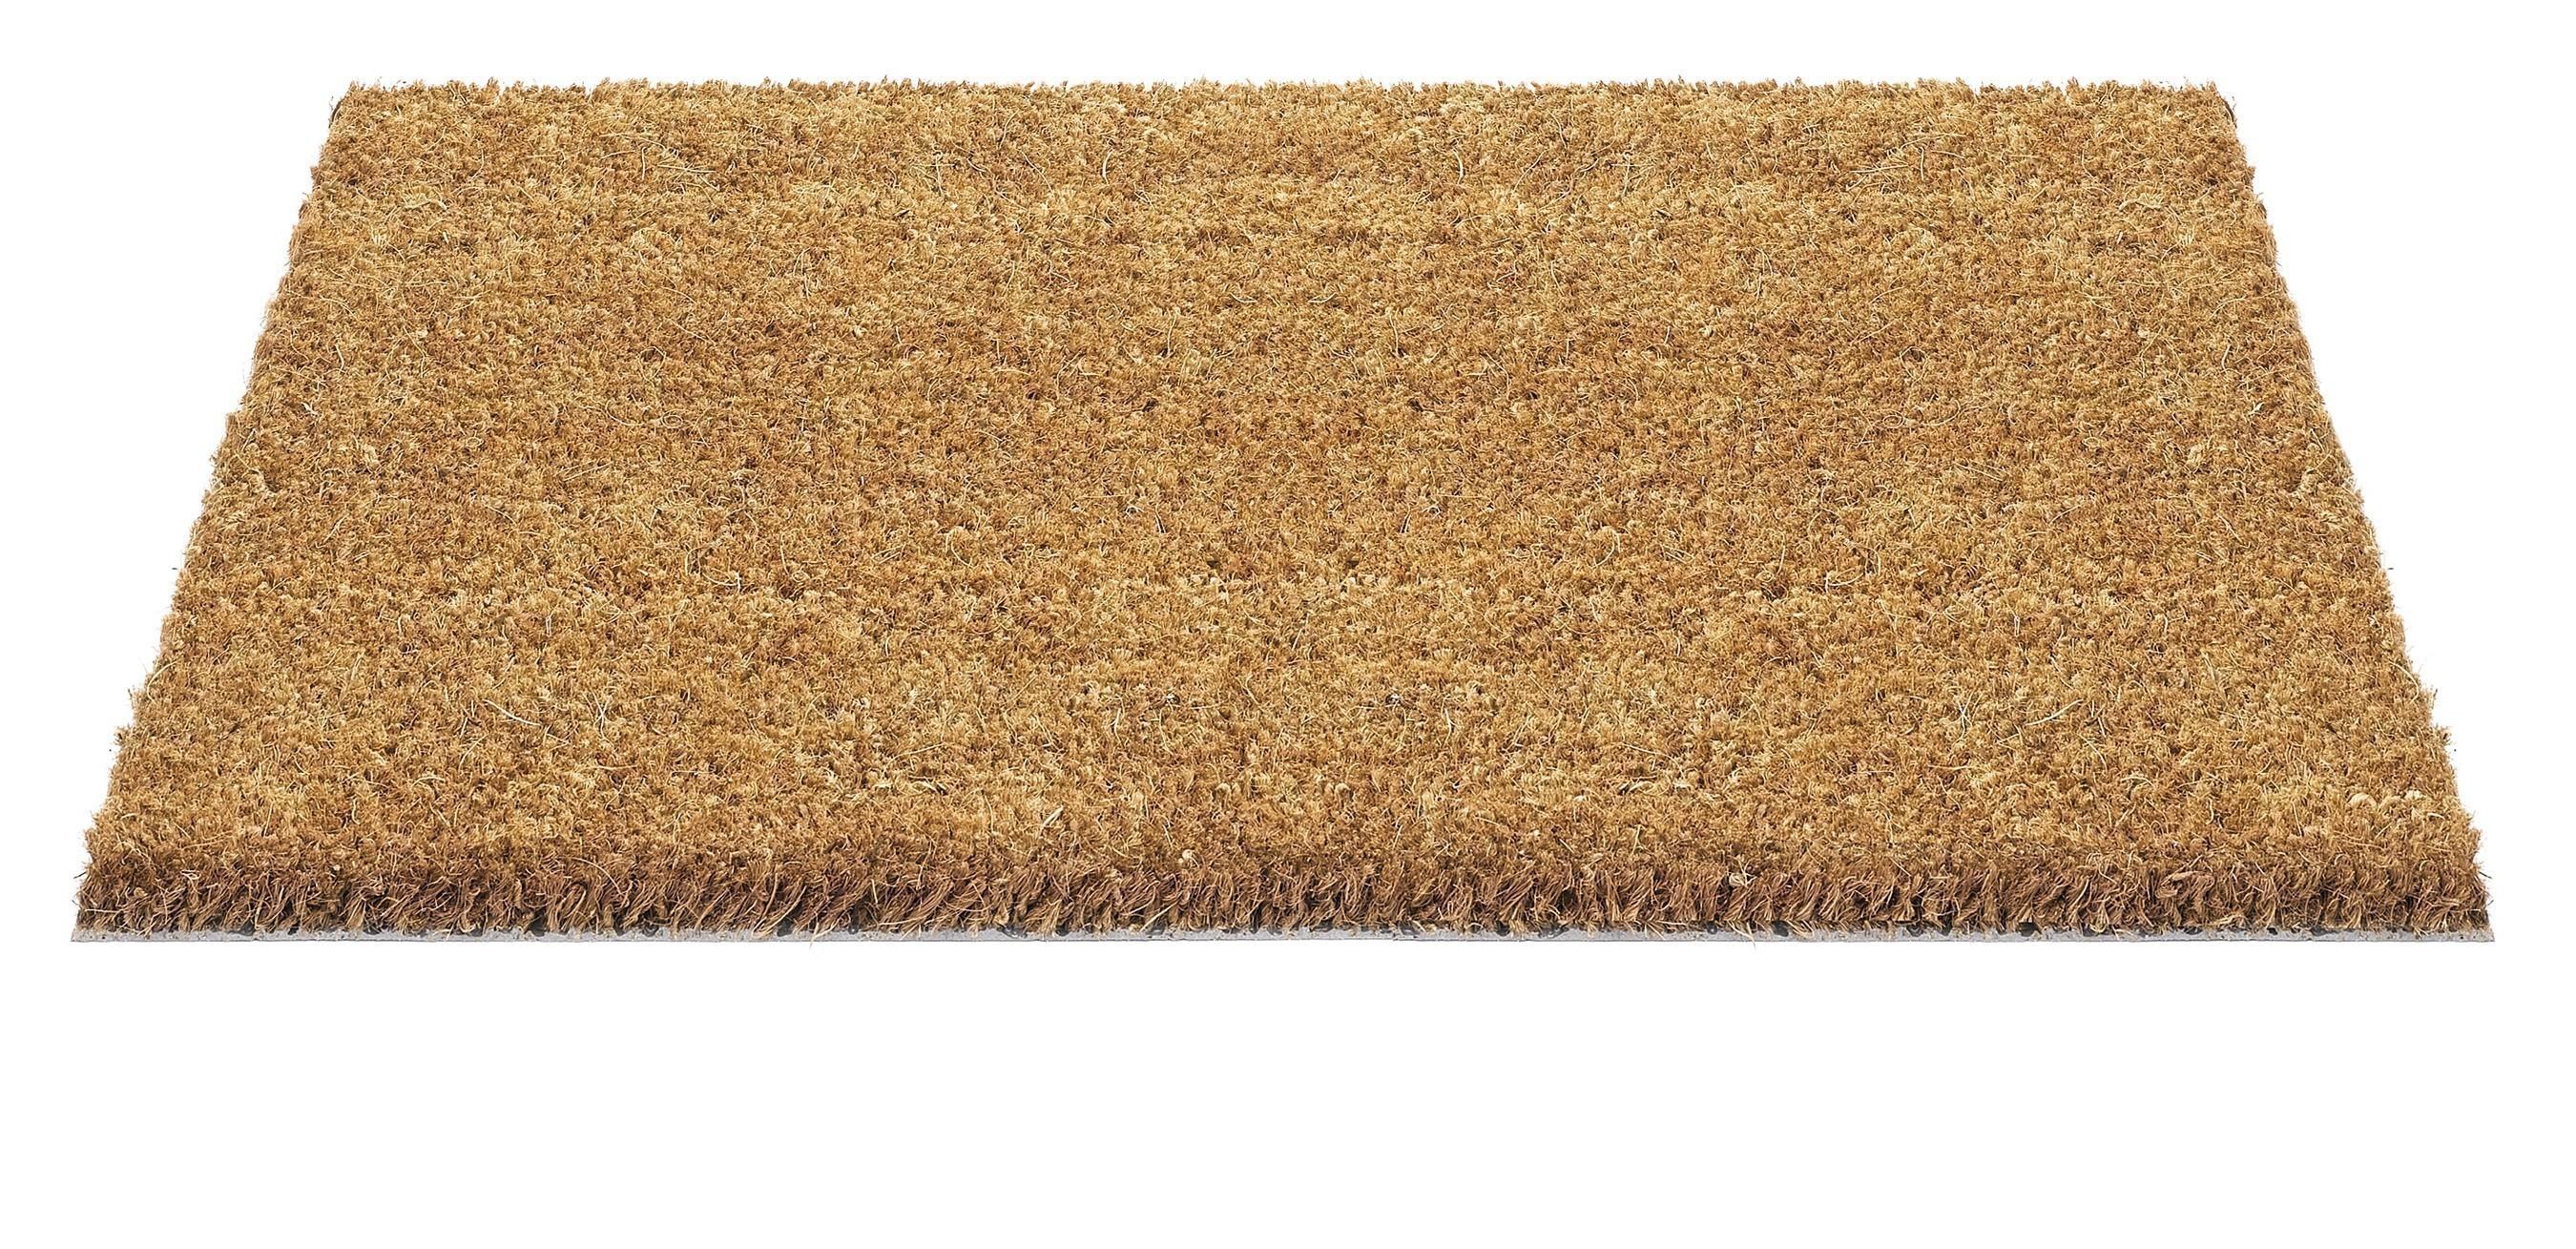 Hamat Fußmatte / Kokos Fußmatte Ruco 40x60cm natur Bild 1